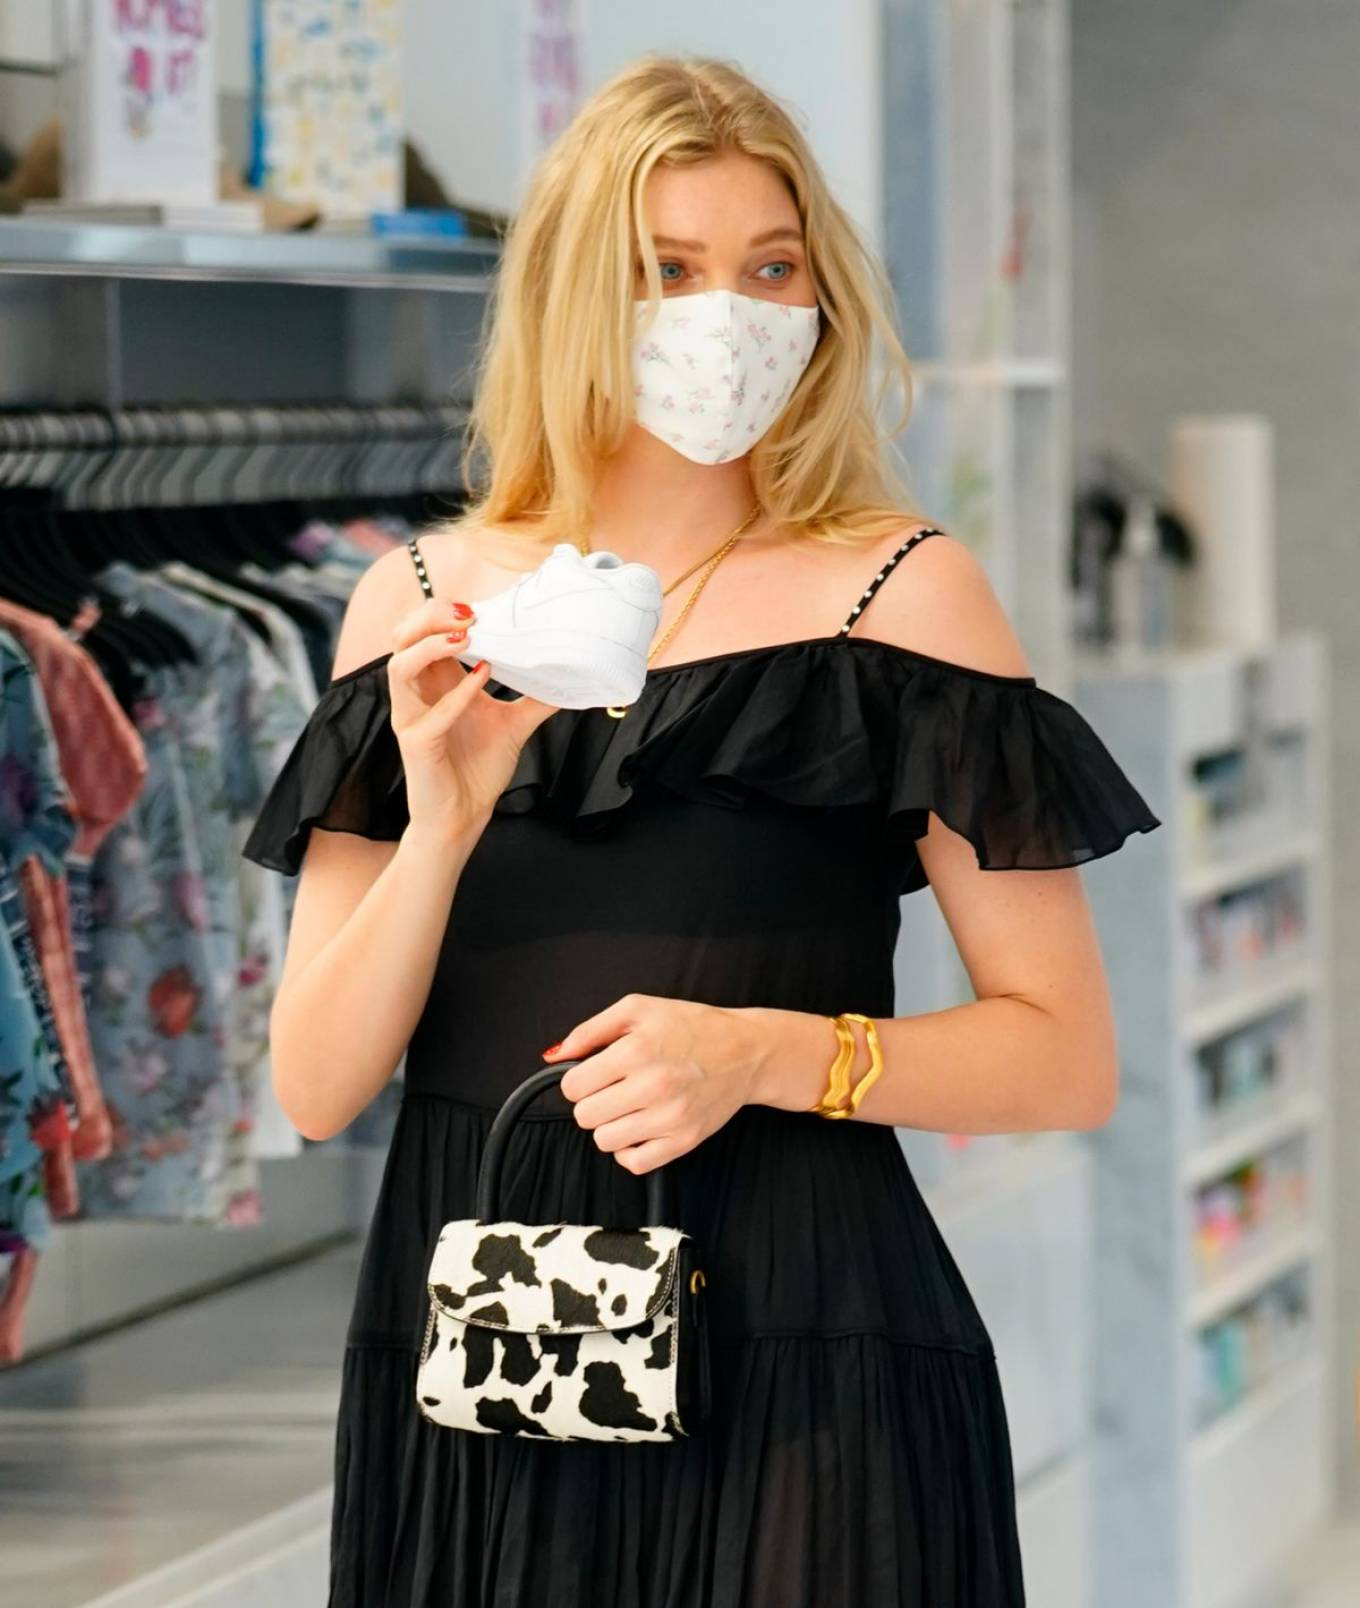 Elsa Hosk 2020 : Elsa Hosk – Wearing mask while out for shopping in New York-10